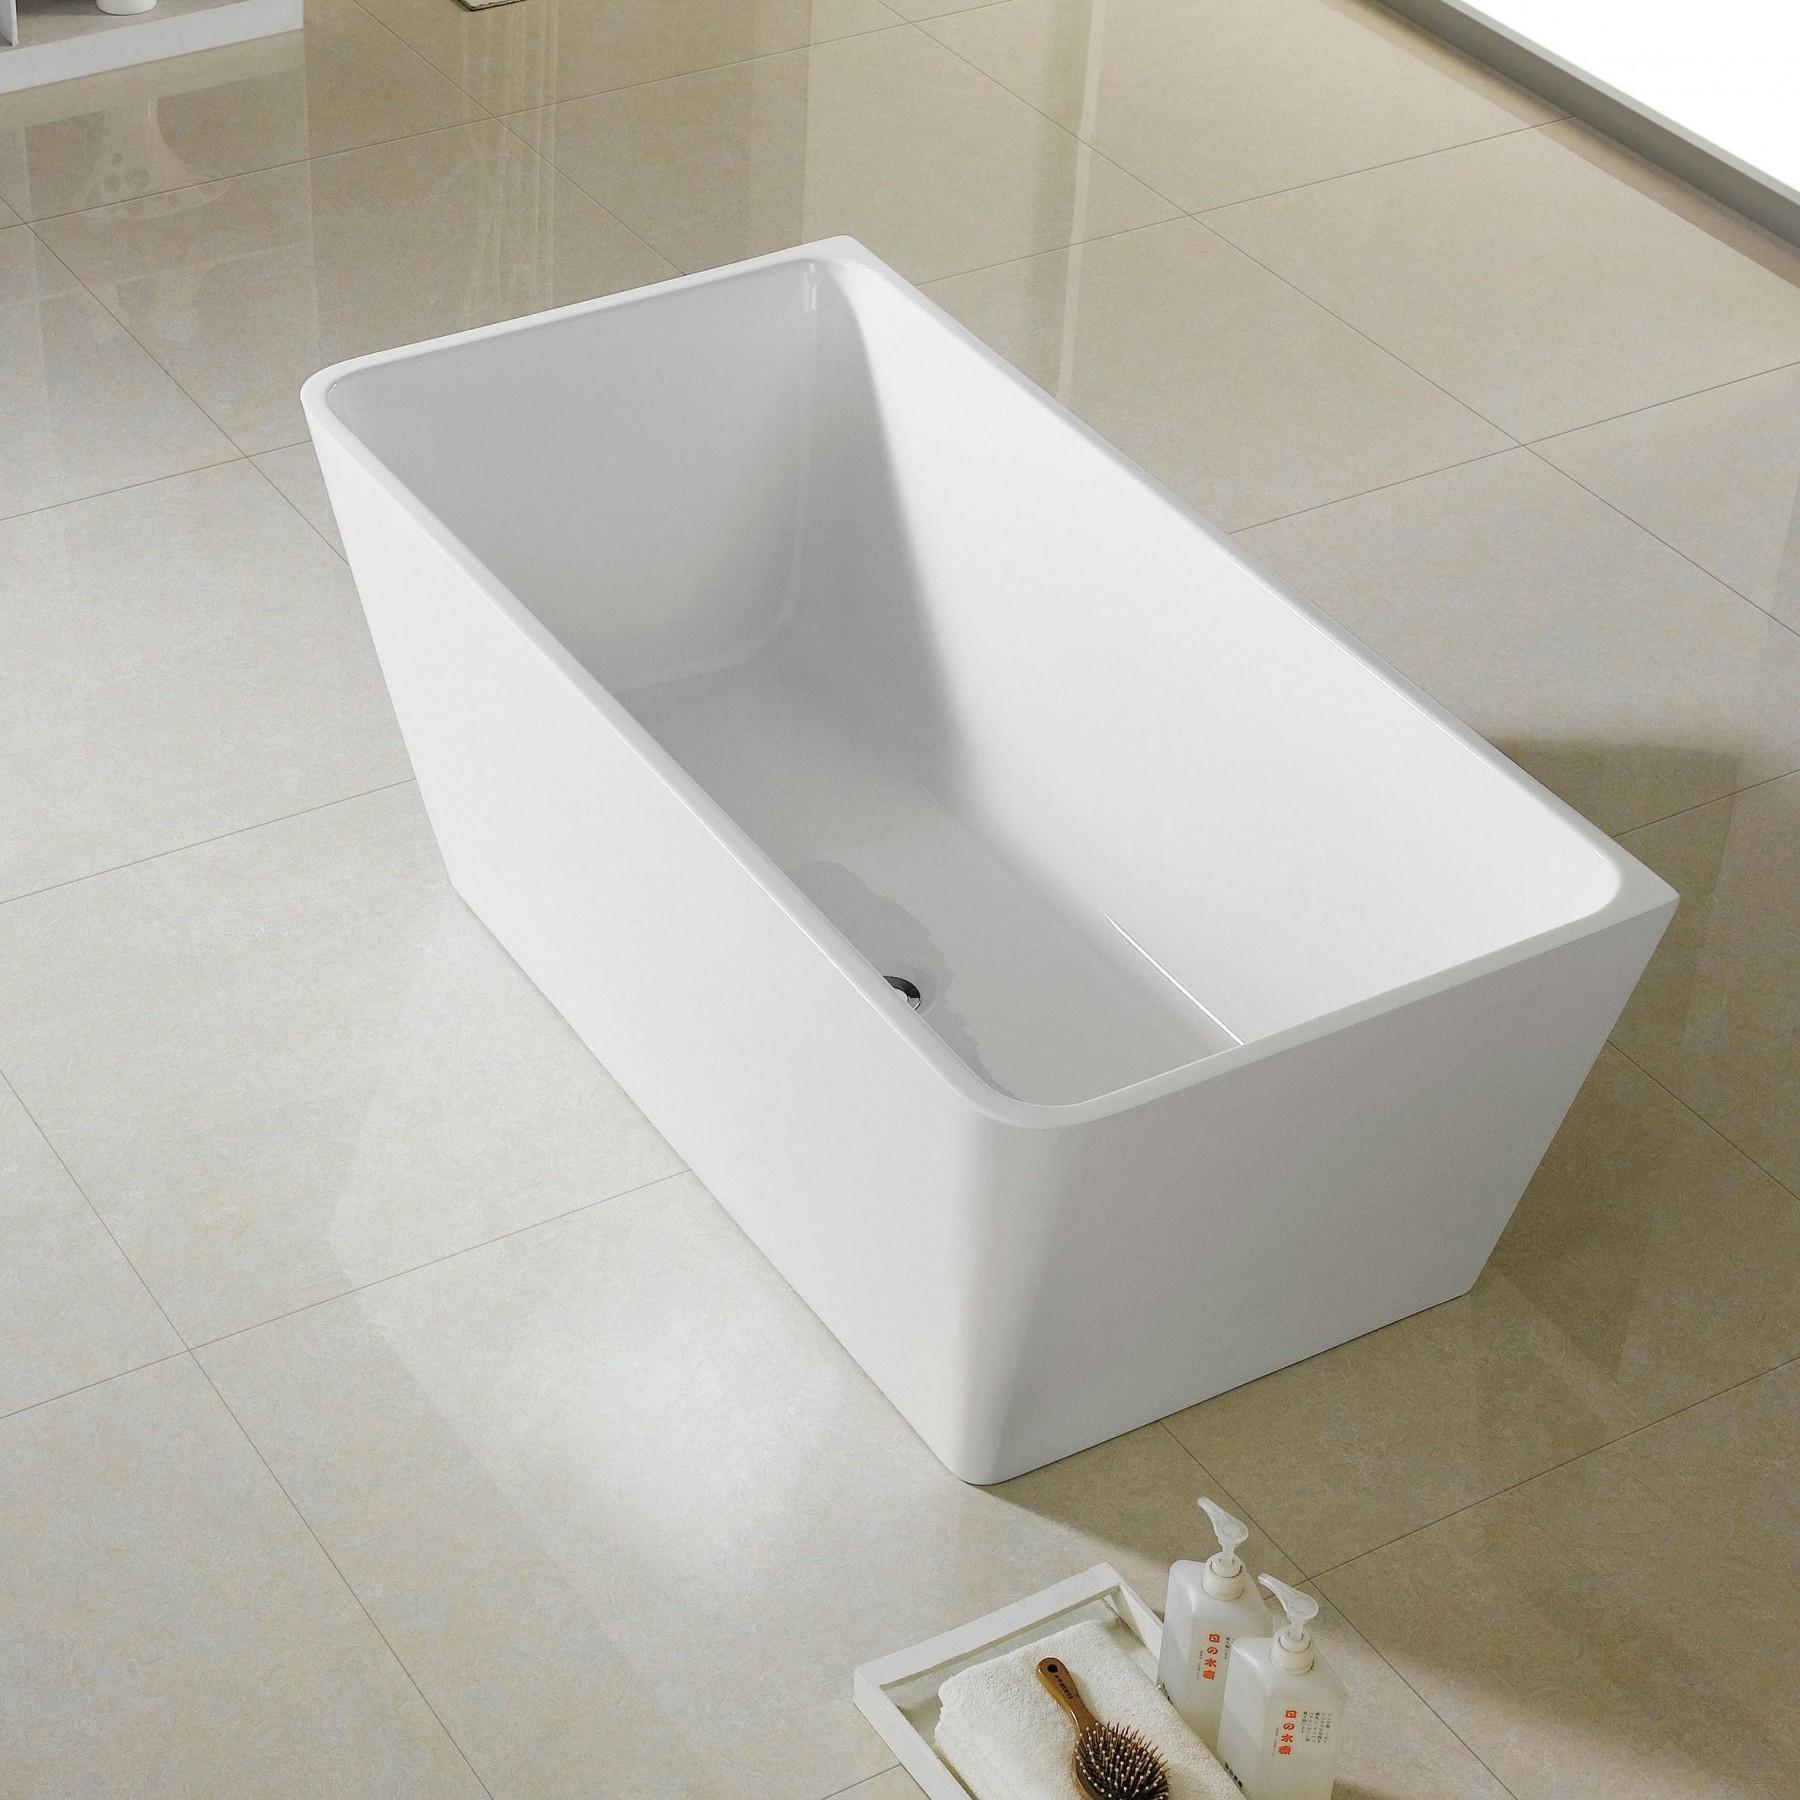 "Bathroom Remodel Burbank: 66"" Burbank Acrylic Freestanding Soaking Bathtub"